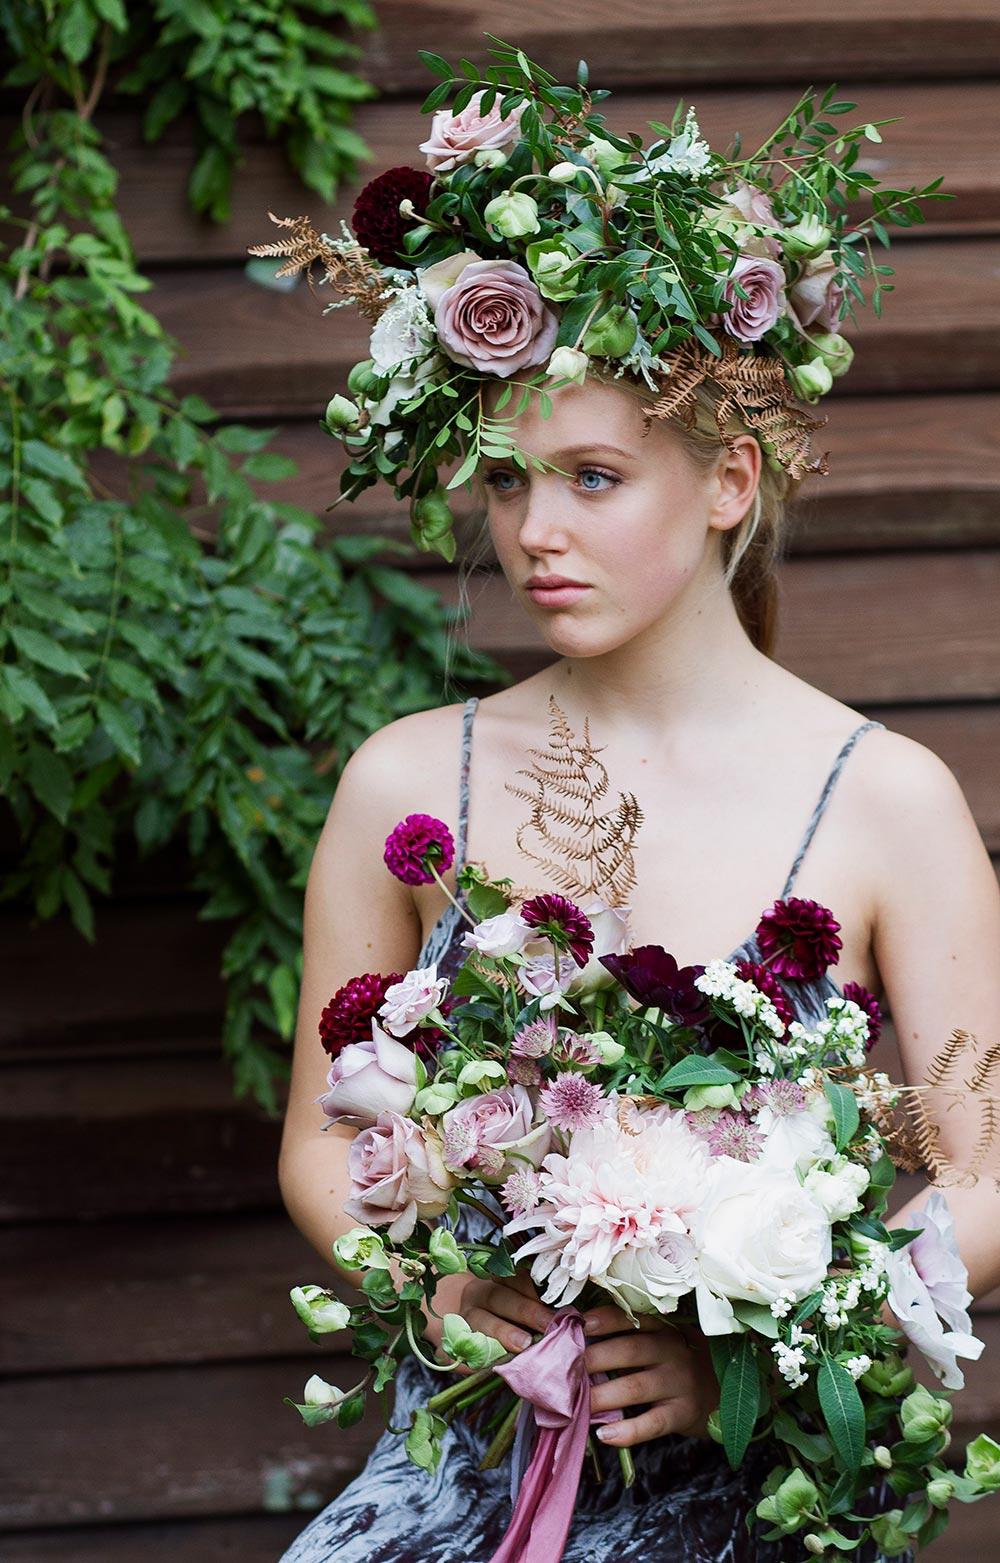 13-wilde-thyme-photoshoot-styling-head-dress.jpg